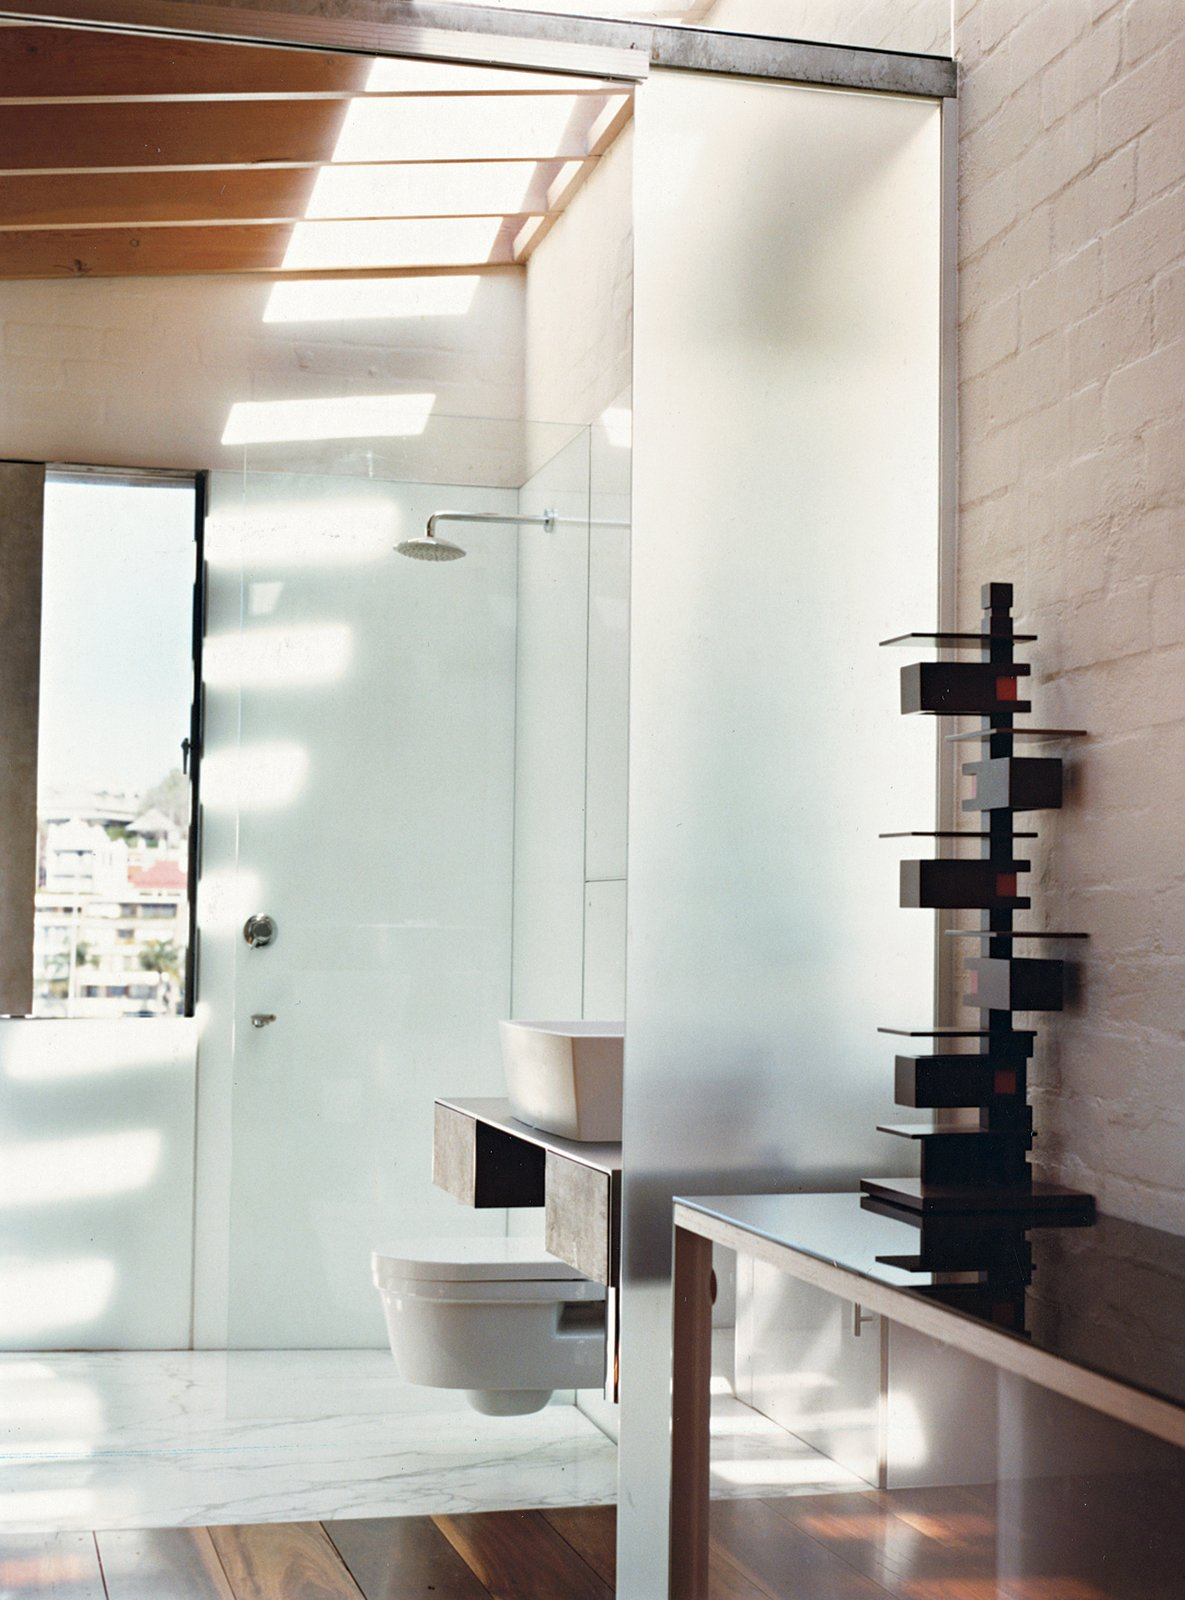 #bath #spa #bath&spa #modern #interior #interiordesign #bathroom #toilet #sink #bathroom #shower #indoor #skylights #catalano # tonkinzulaikhagreerarchitects  Photo by Roger D'Souza   Photo 16 of 22 in Bath & Spa Intrigue from Bathroom